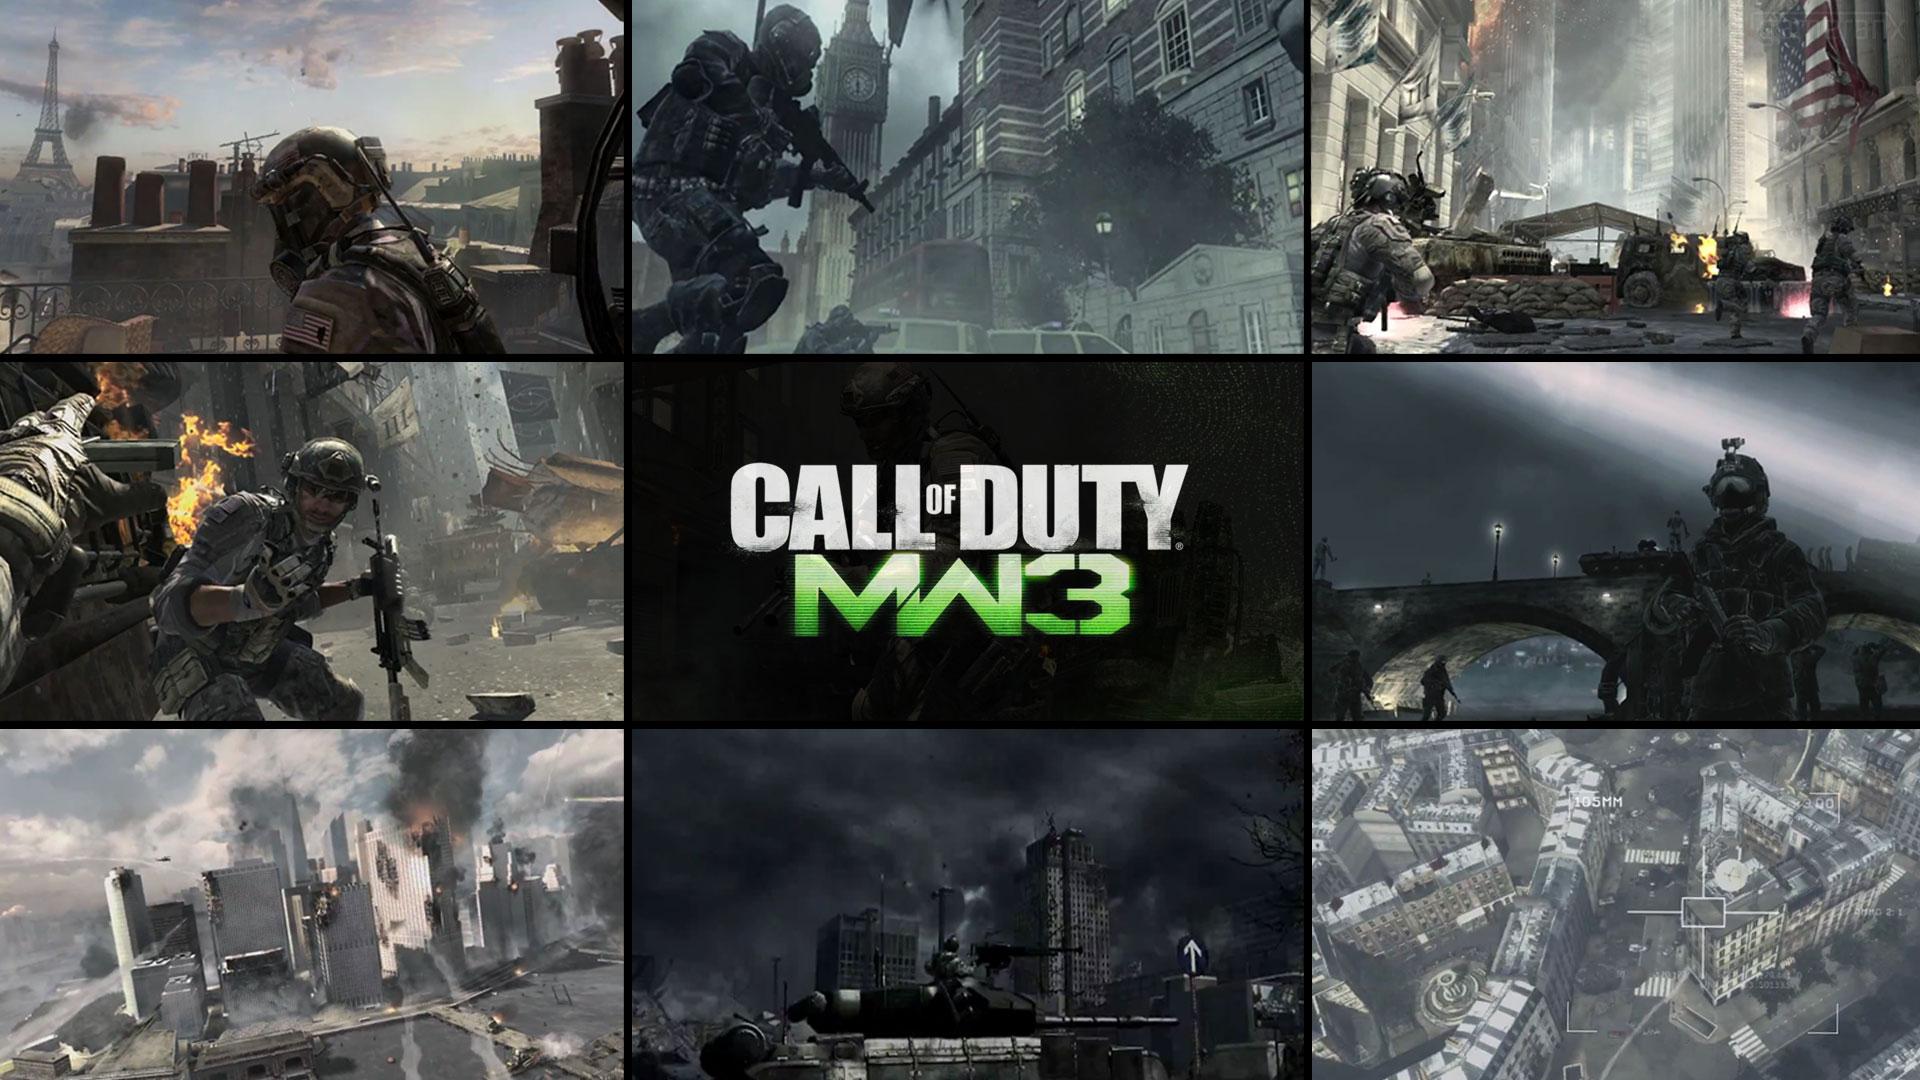 Call of Duty Modern Warfare 3 wallpaper 3